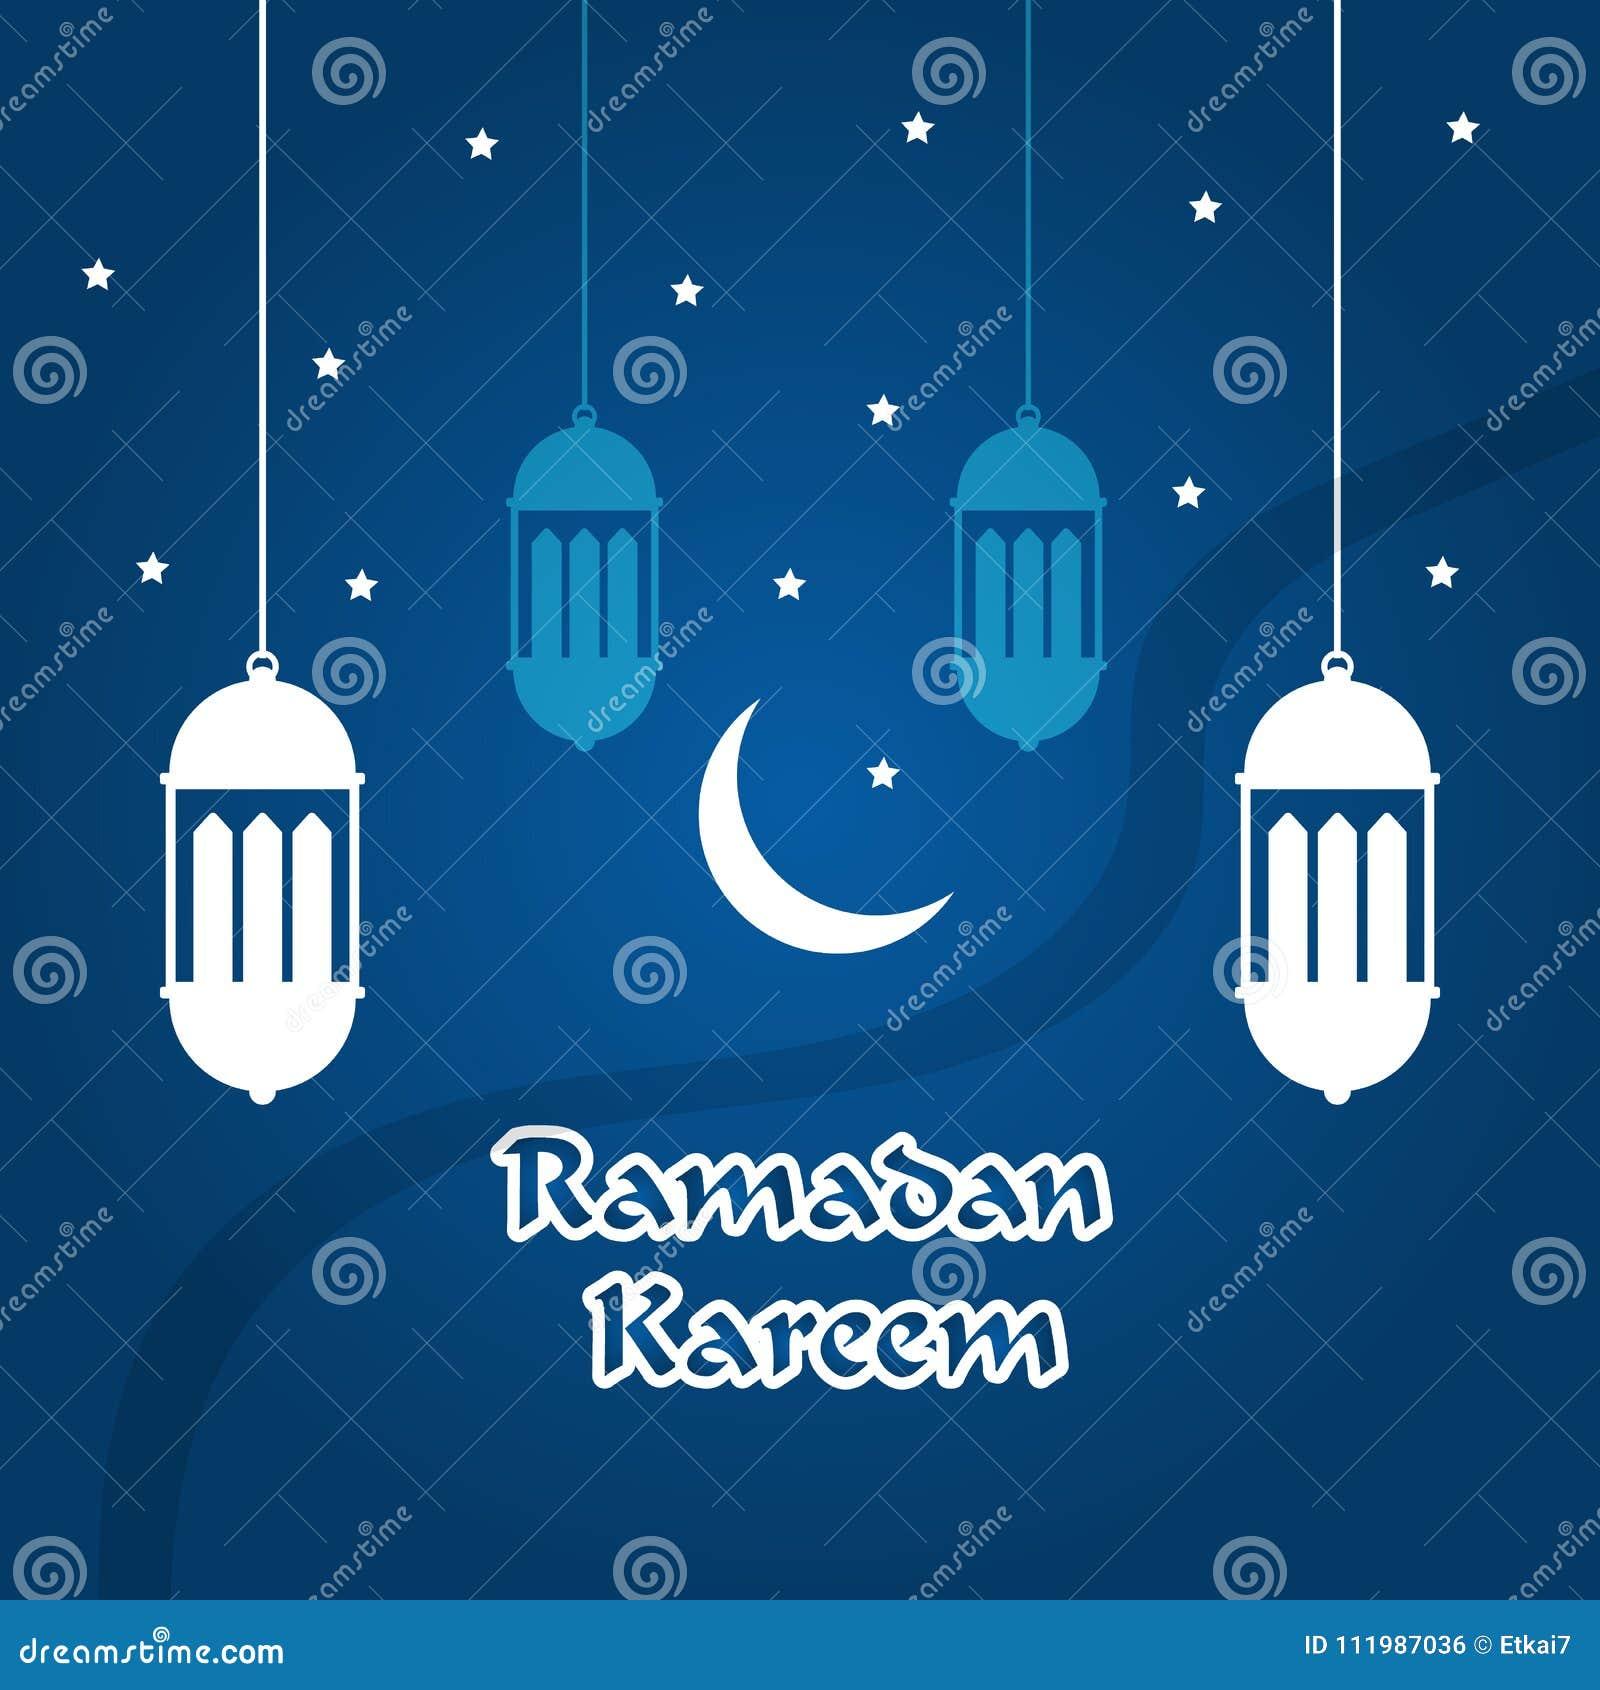 Ramadan Kareem Greeting Card With Islamic Ornaments And Candle V